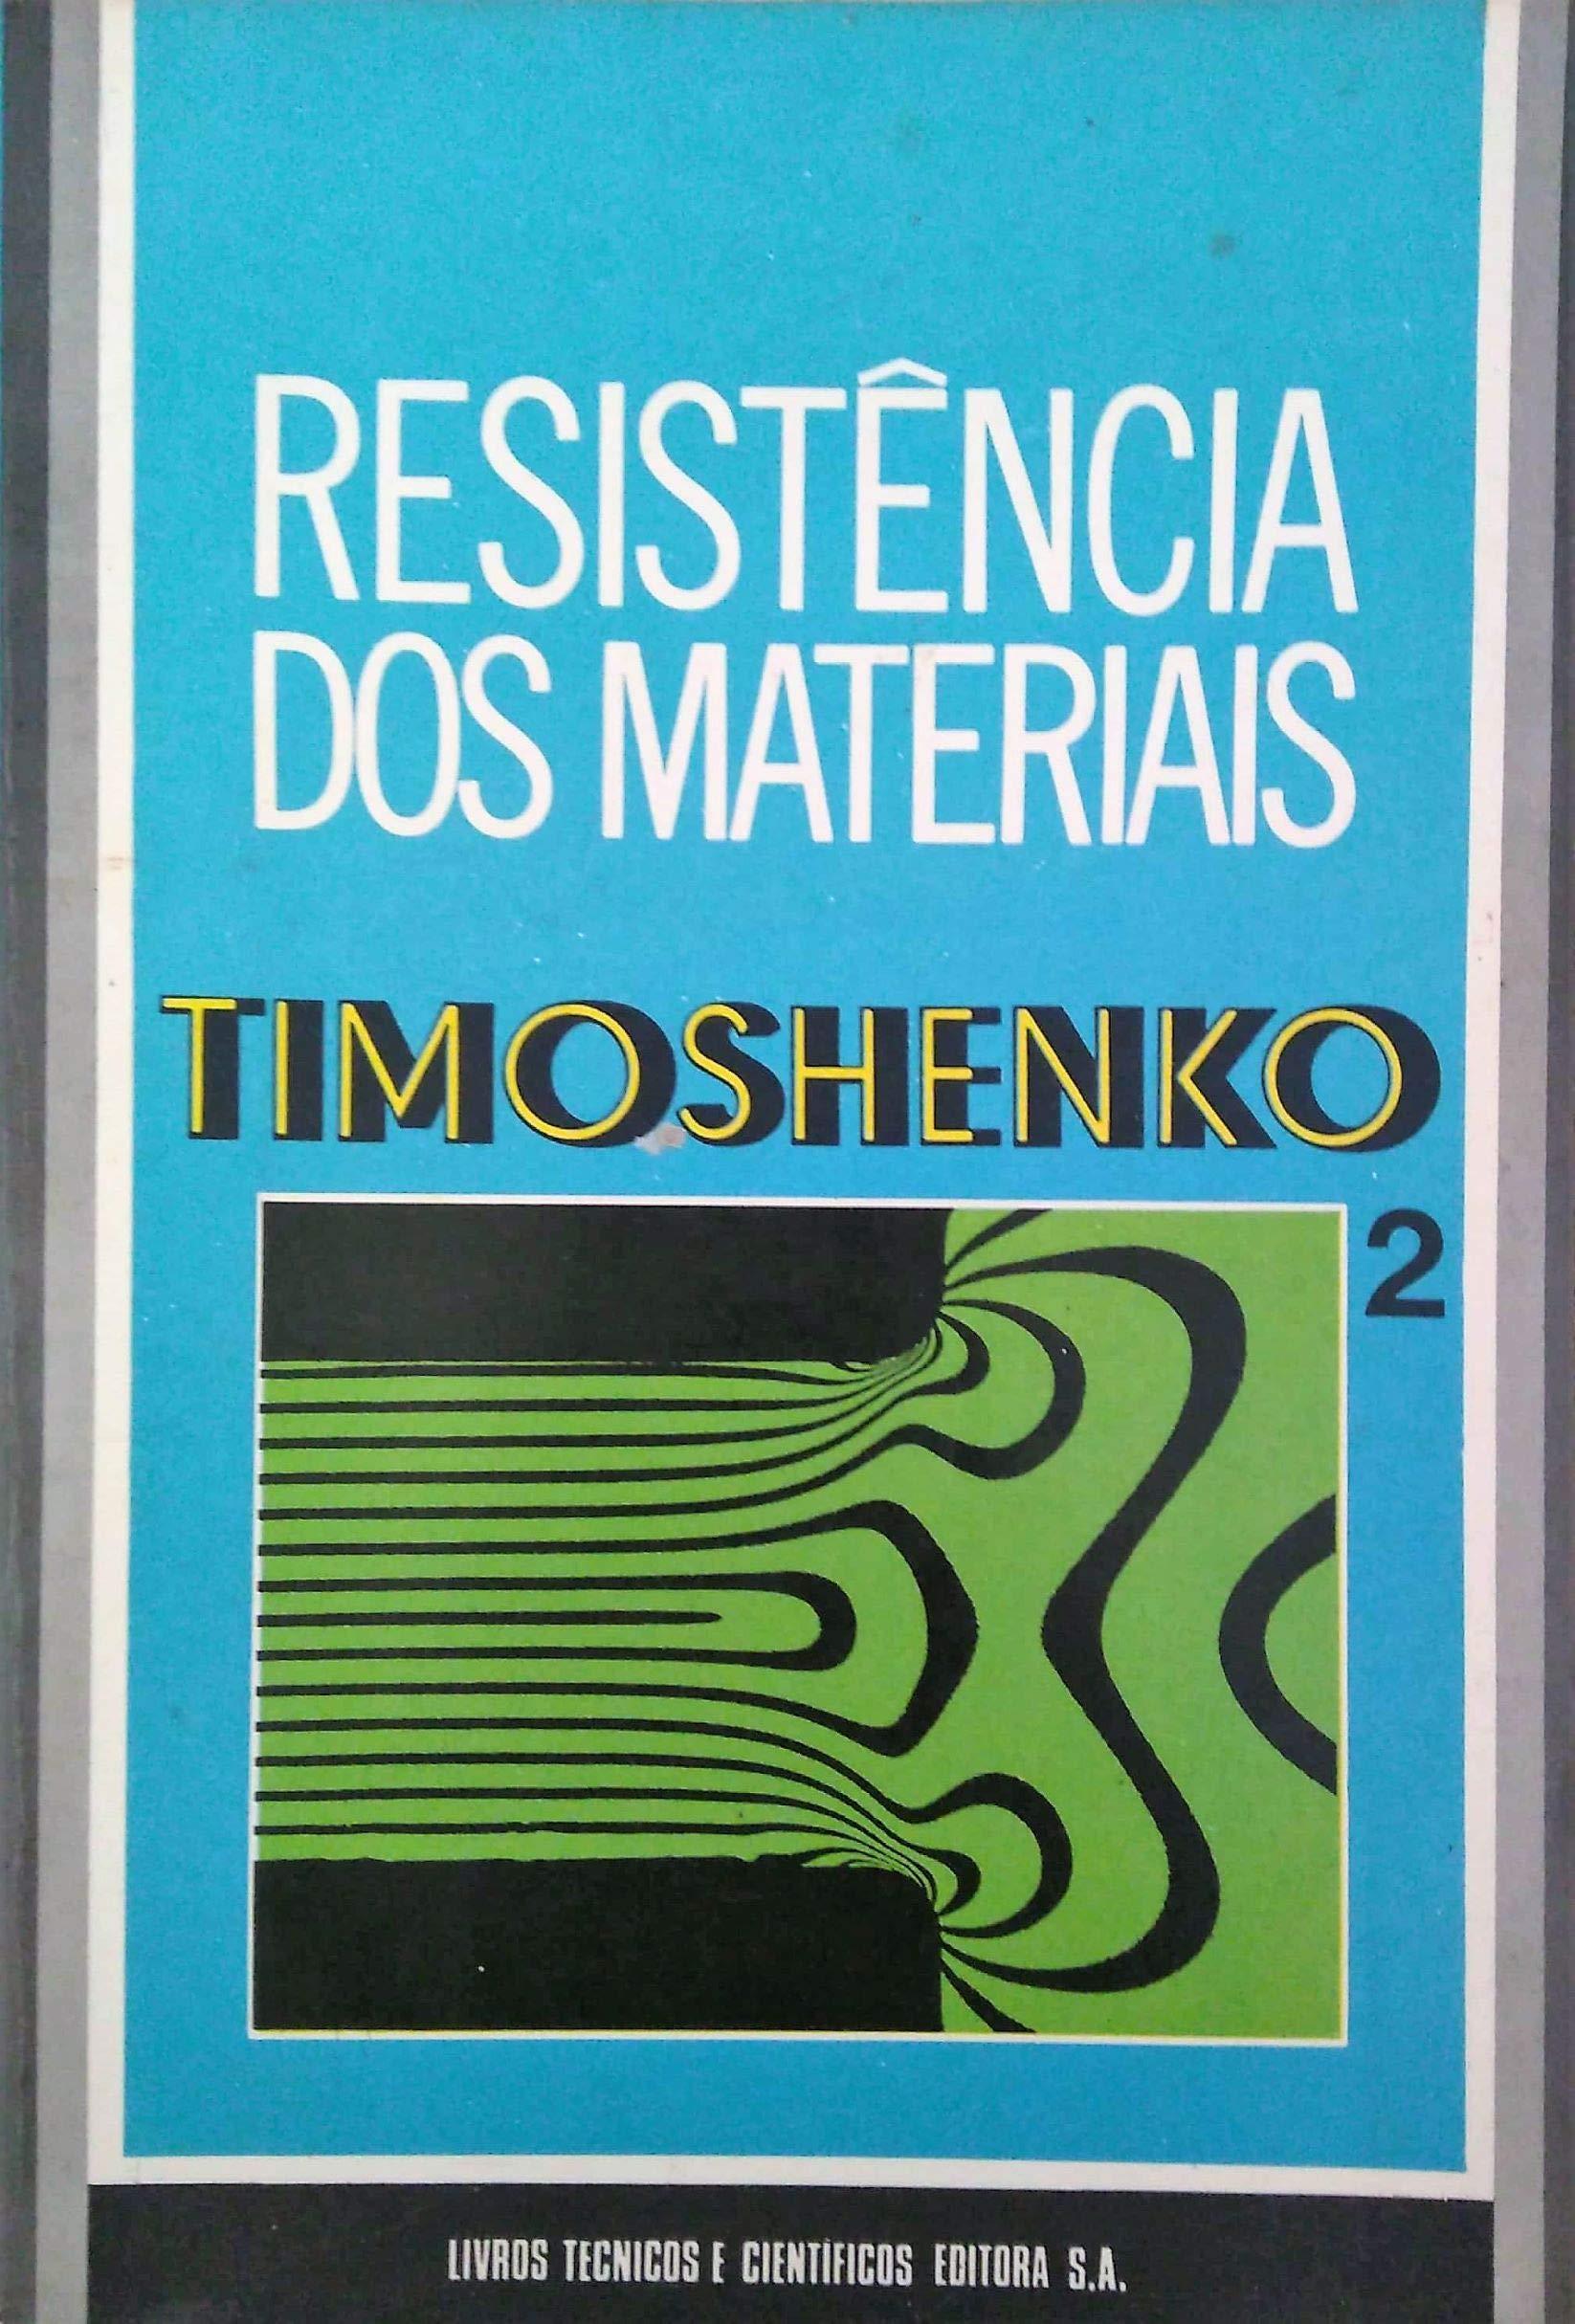 livro de resistencia dos materiais timoshenko